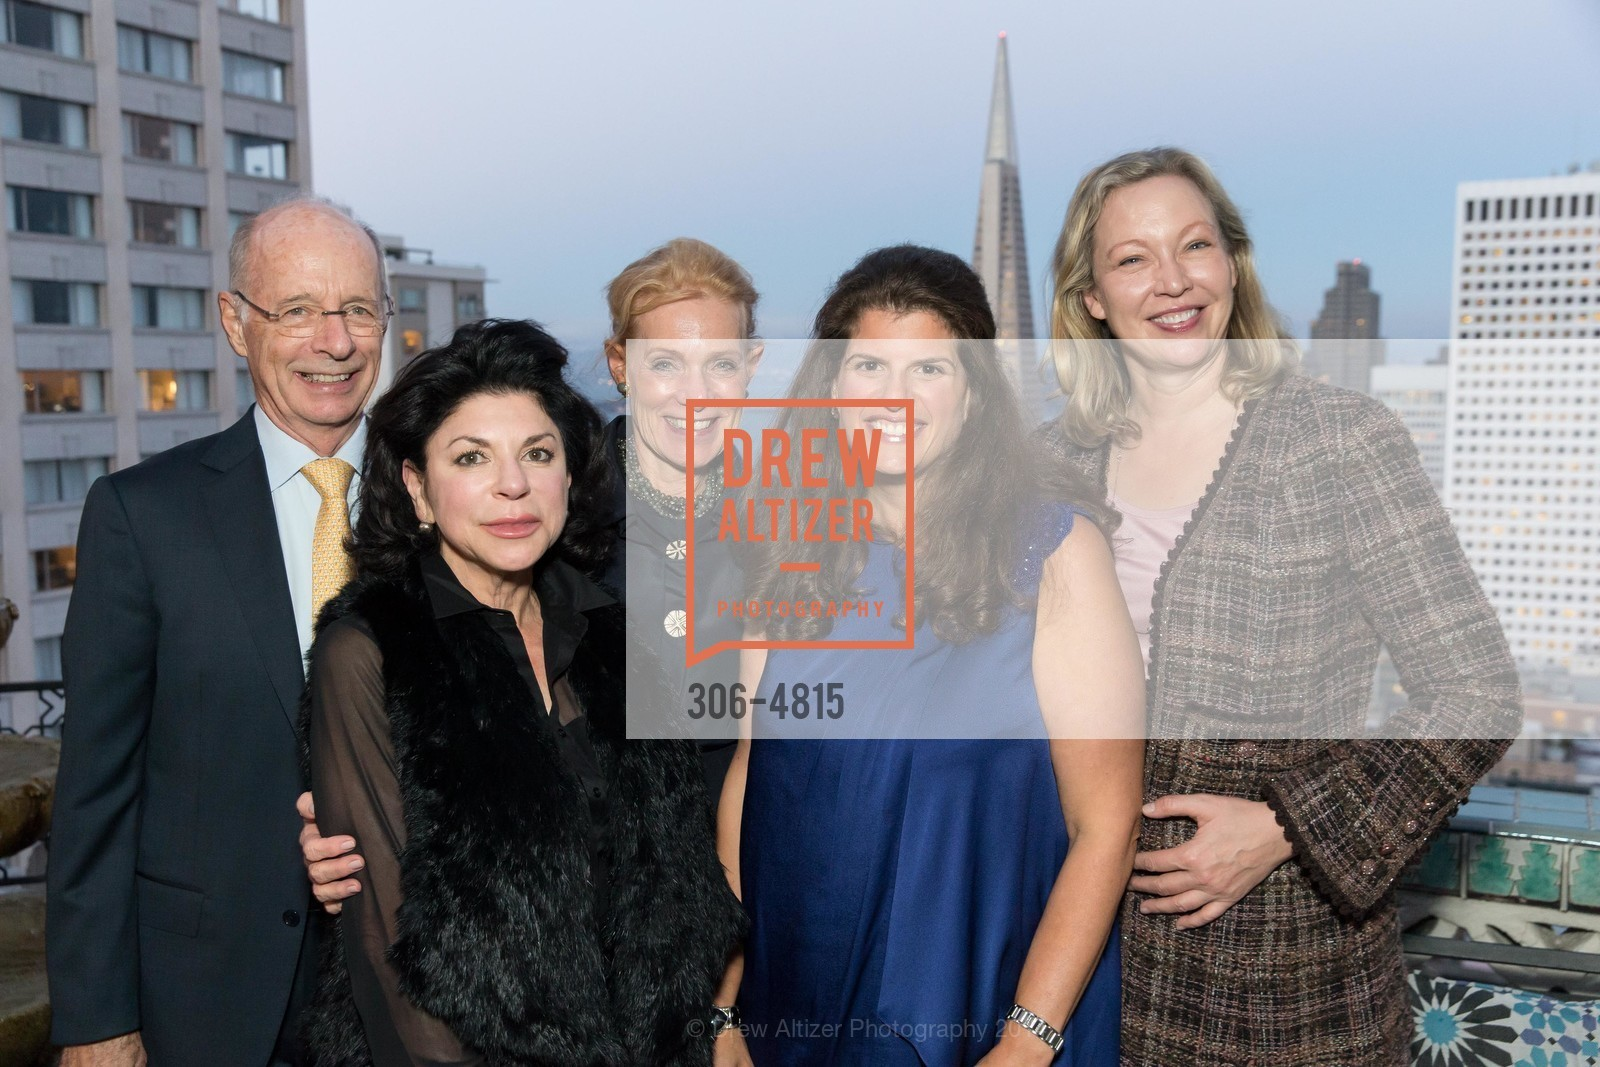 Tom Webster, Judy Webster, Amy Wender-Hoch, Betsy Vobach, Photo #306-4815